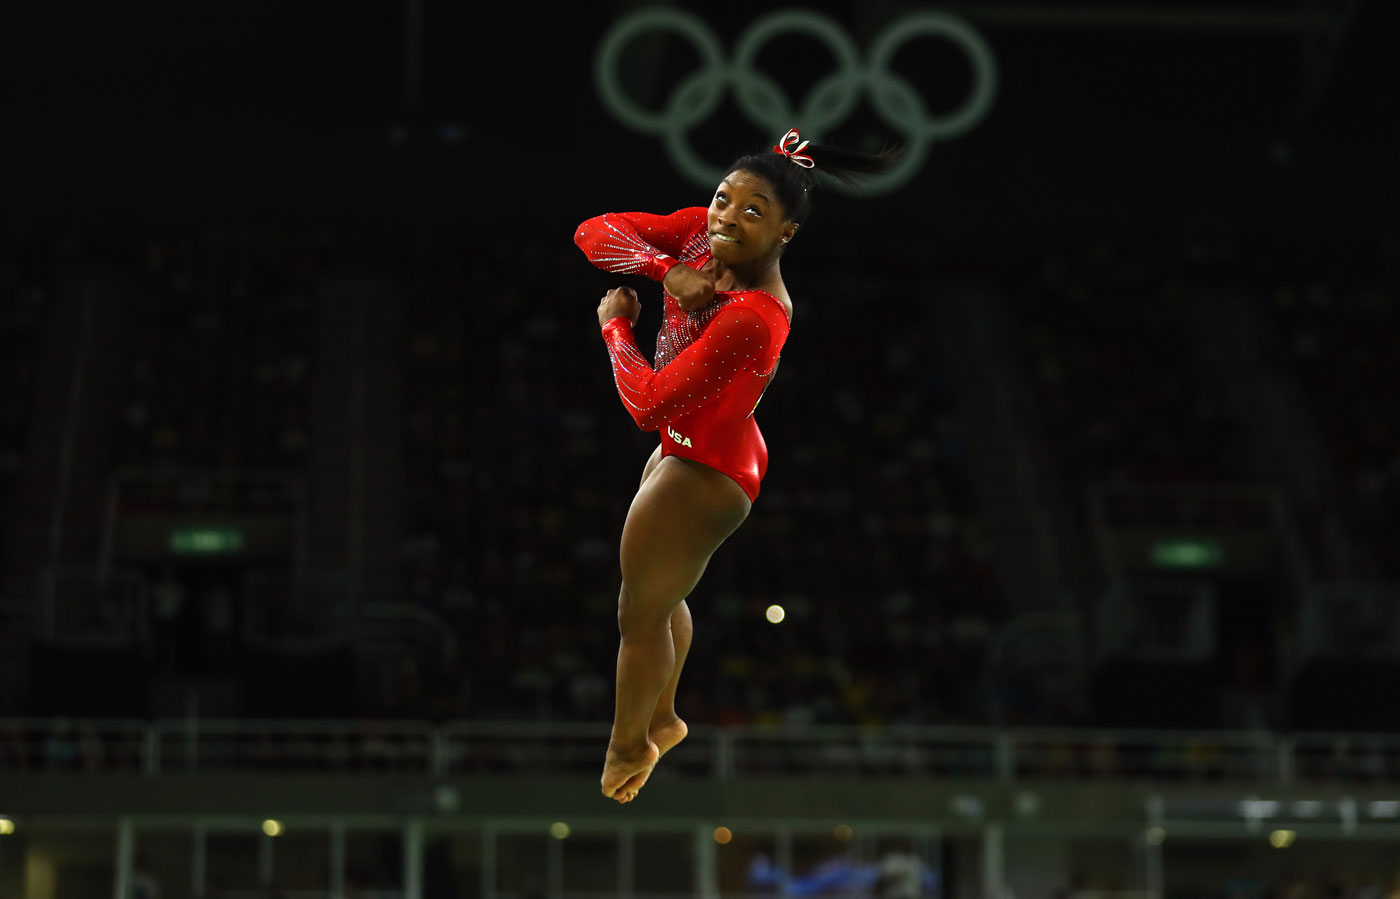 2016 Rio Olympics - Artistic Gymnastics - Women's Vault Final